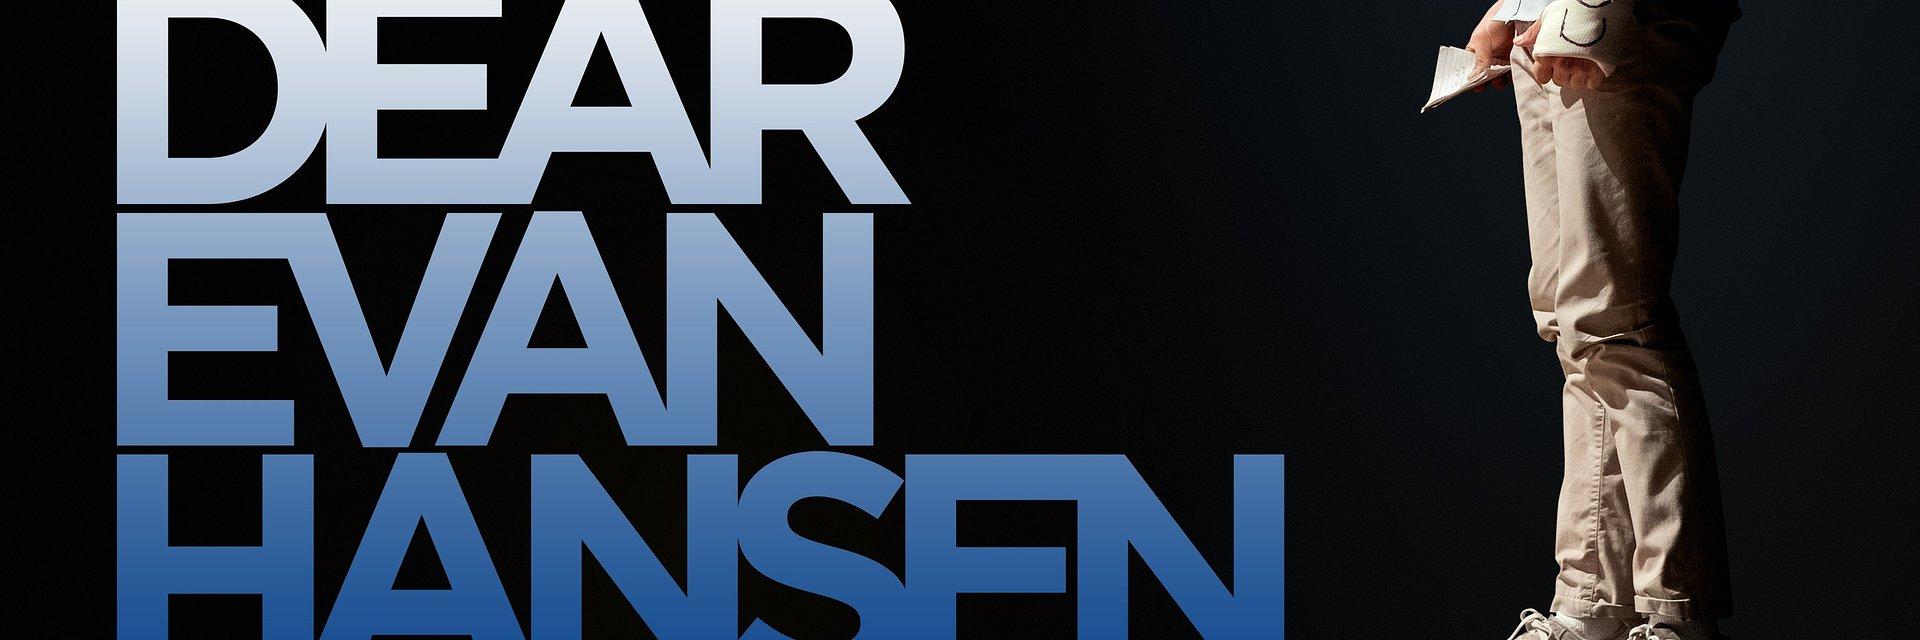 "Soundtrack do filmu ""Drogi Evanie Hansenie"" już dostępny!"